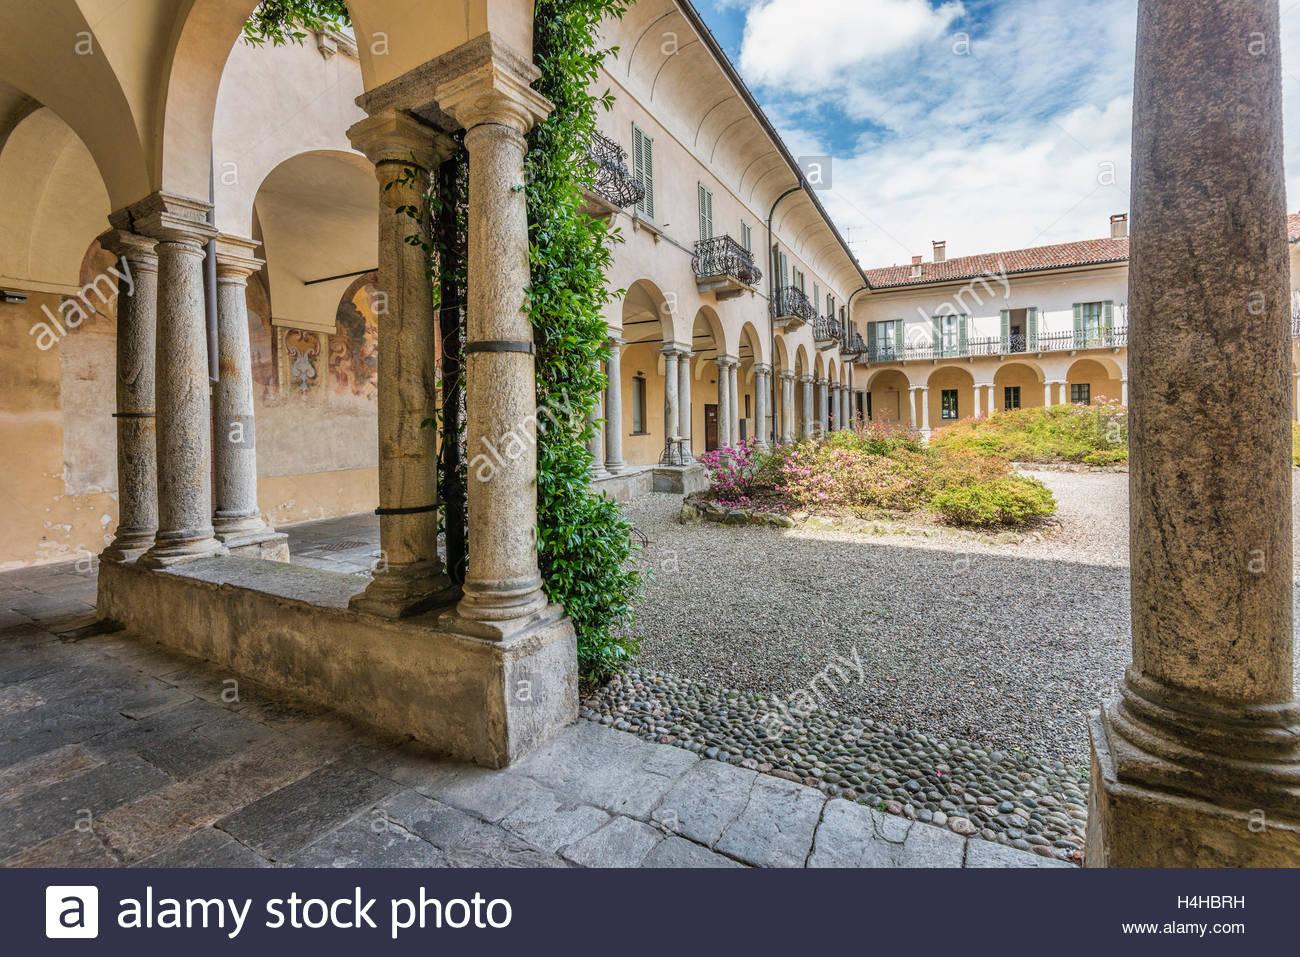 Varese Italien courtyard of monastero di s antonino varese italy innenhof des